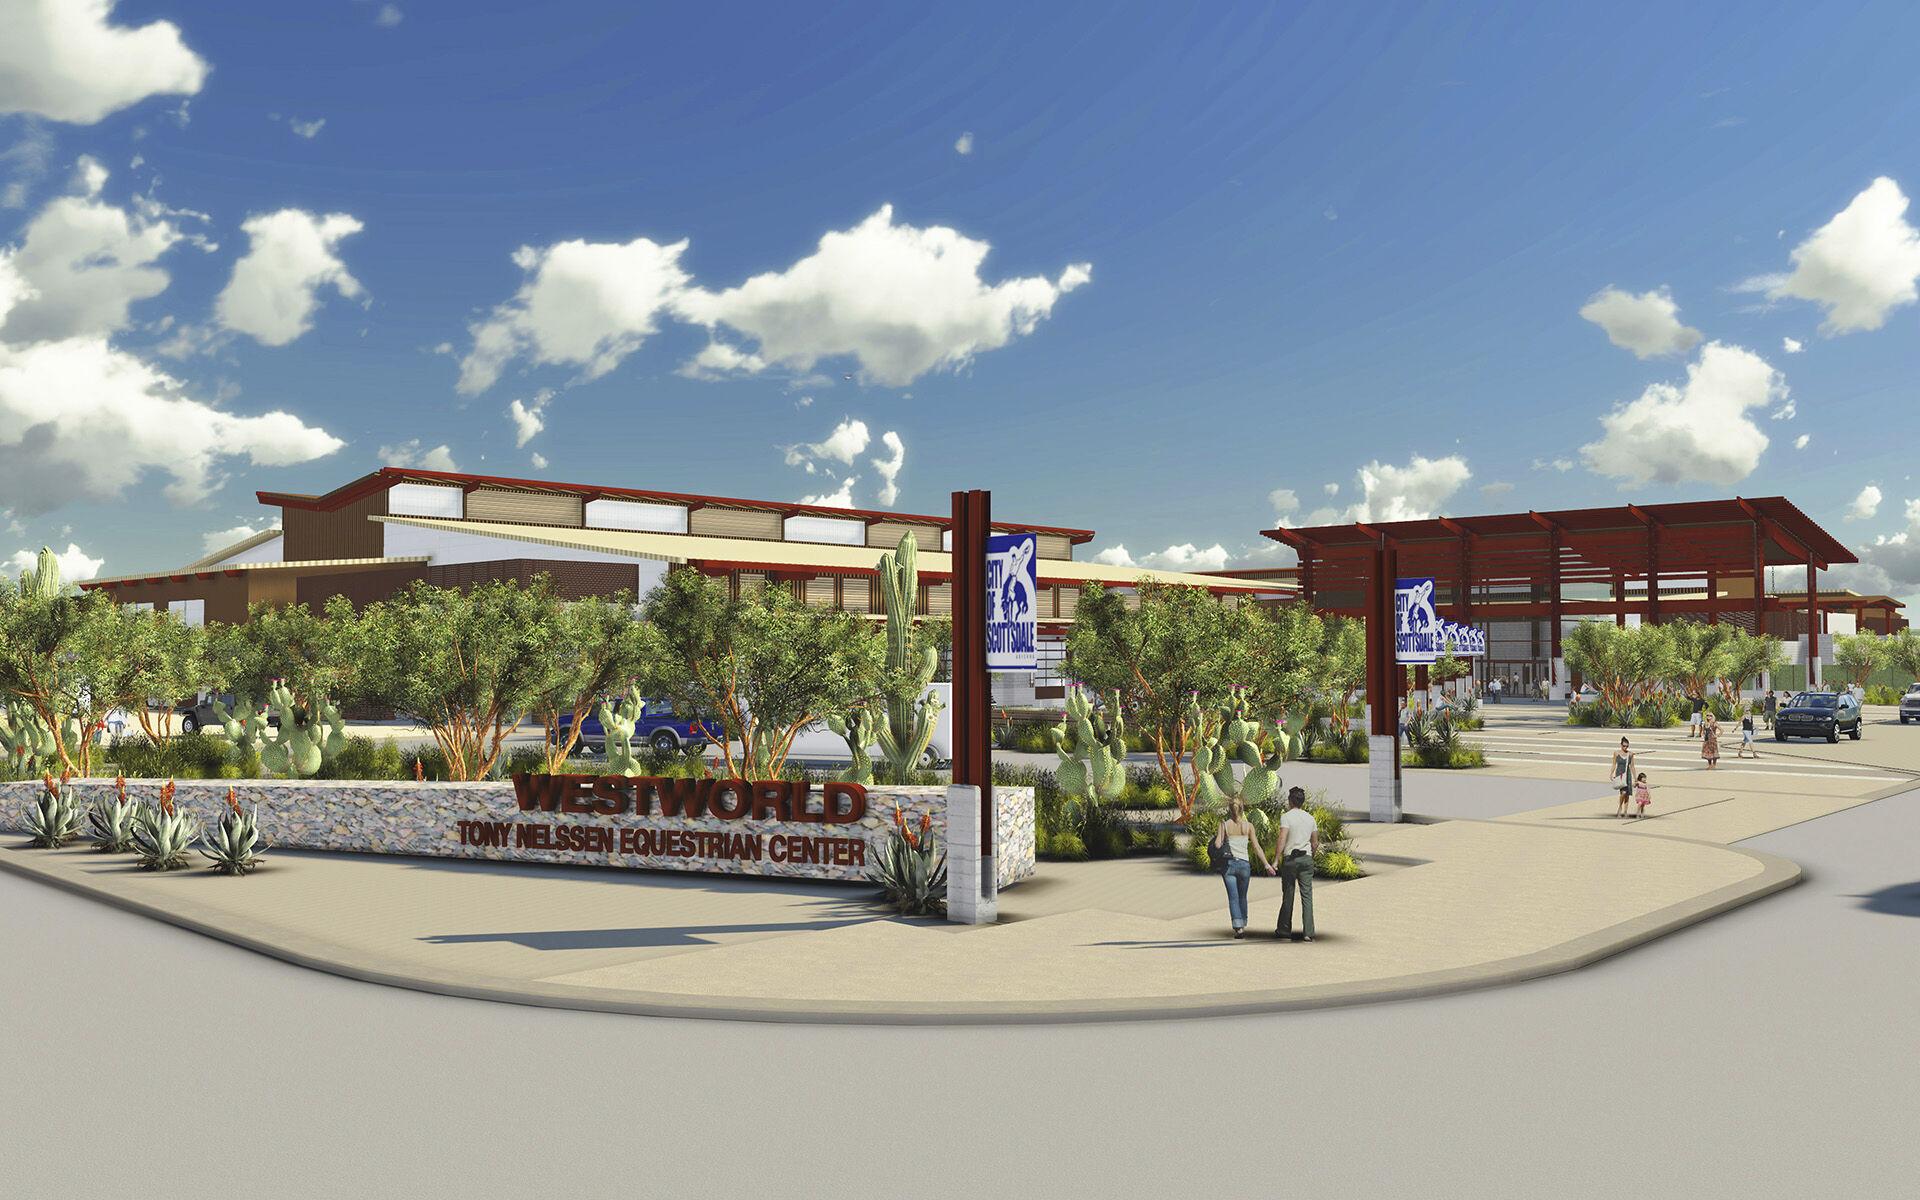 Tony Nelssen Equestrian Center - WestWorld of Scottsdale